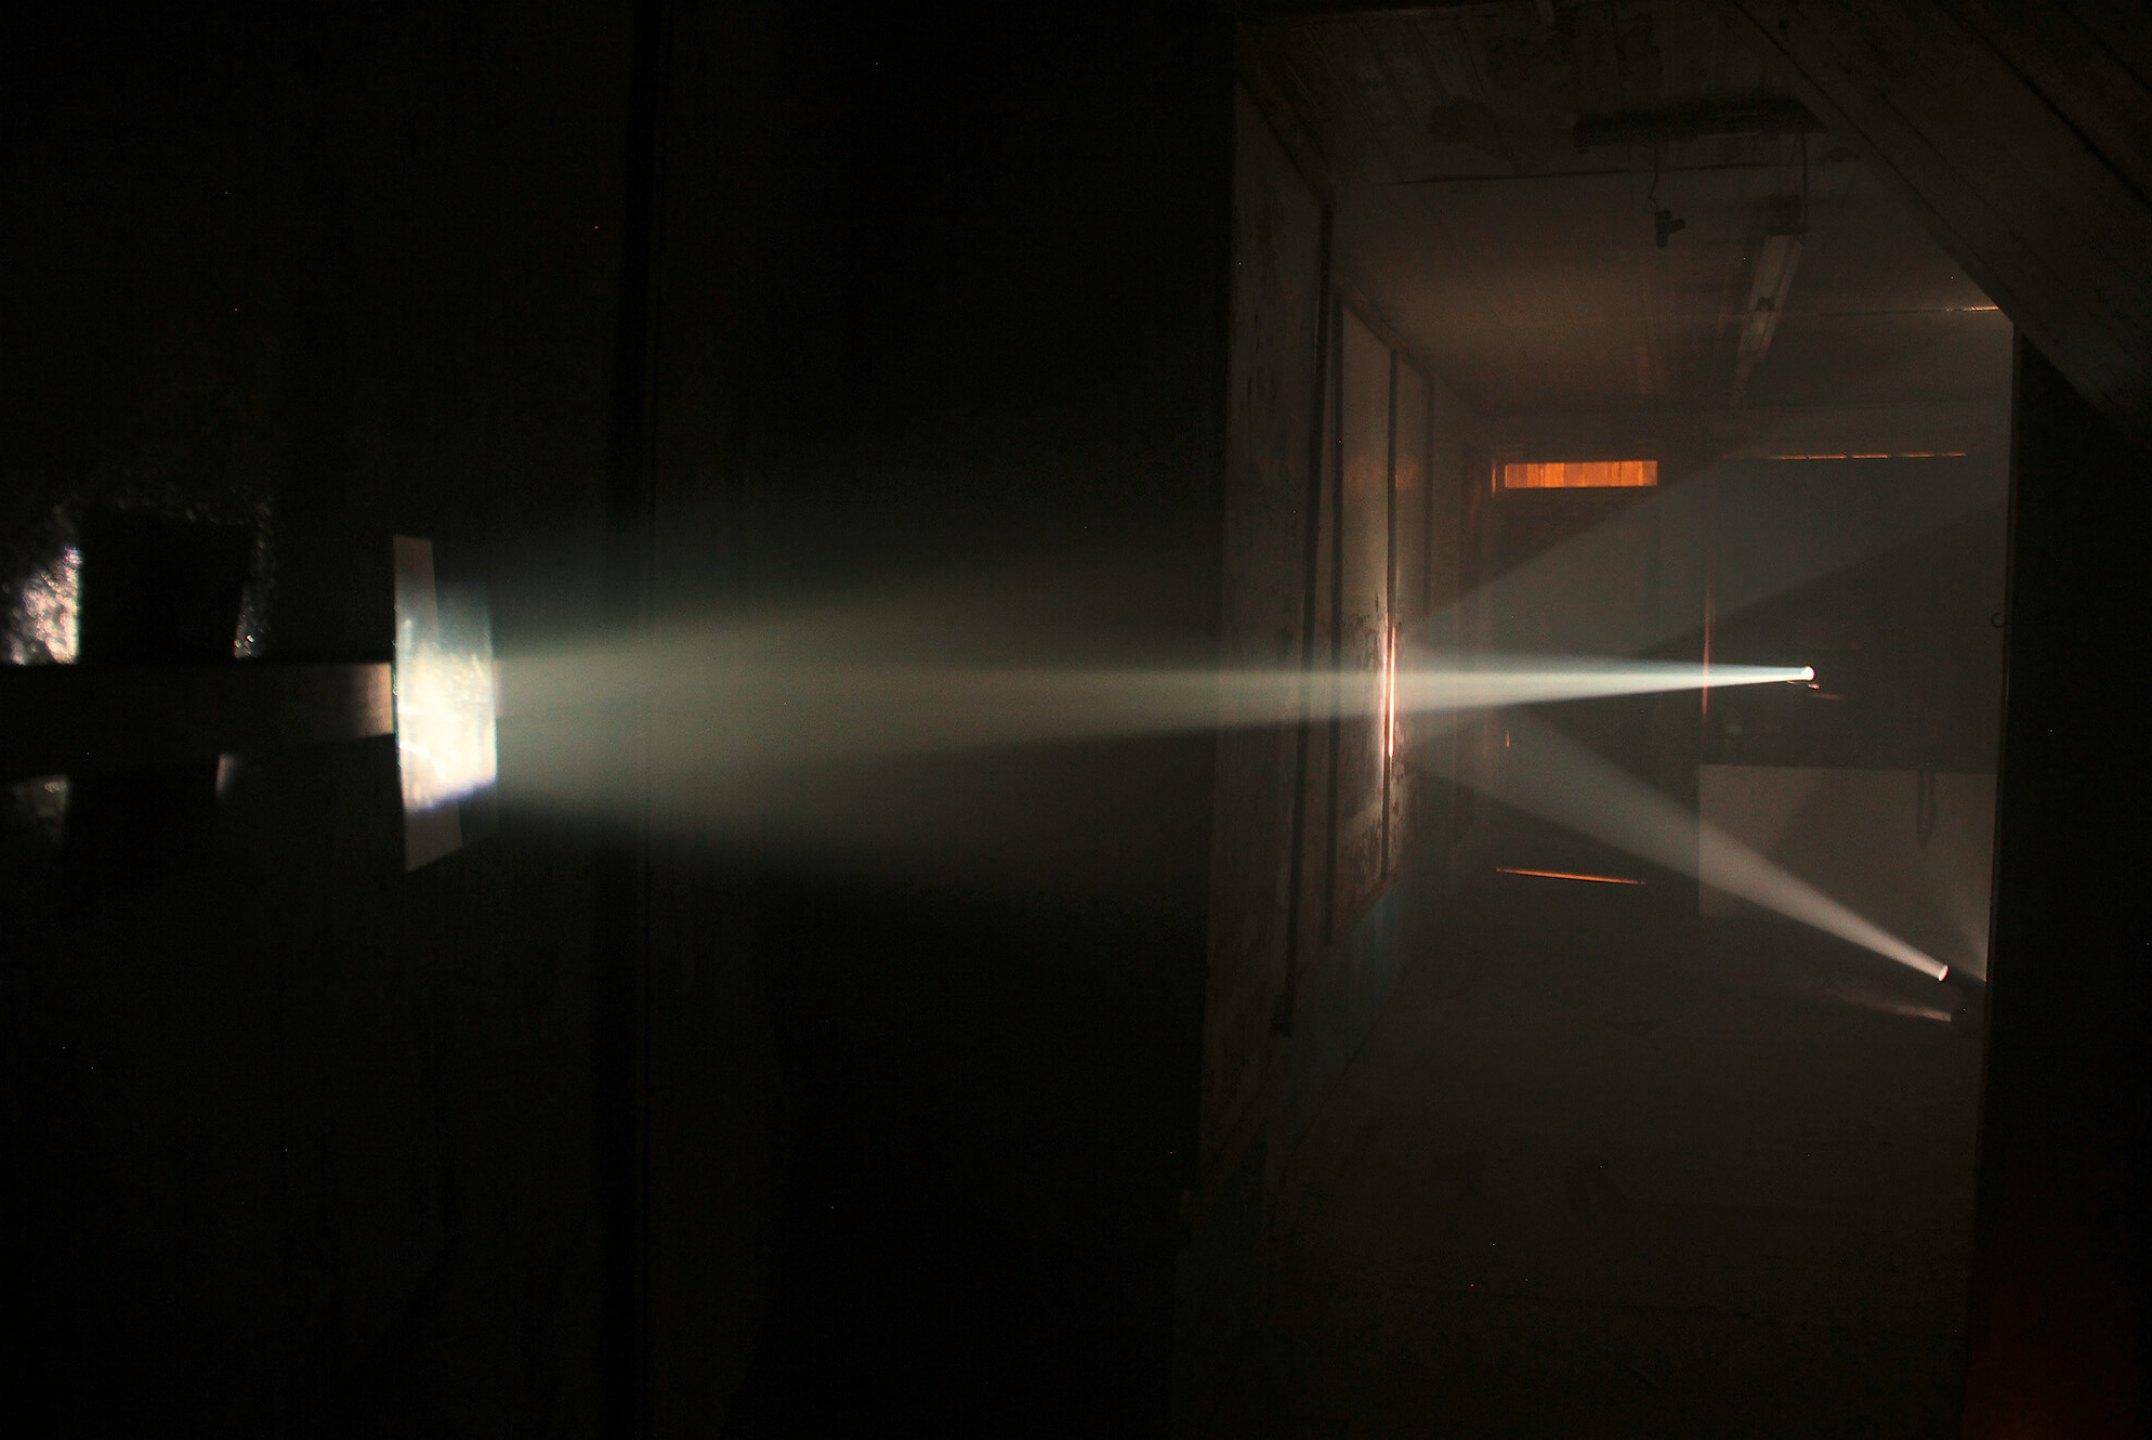 Daniel Steegmann Mangrané,<em>Bicho de nariz delicado</em>,2013, installation view atUma Certa Falta de Coherência,two slides projectors, uniques slides, mirrors, smoke, gilded, canvas - Mendes Wood DM